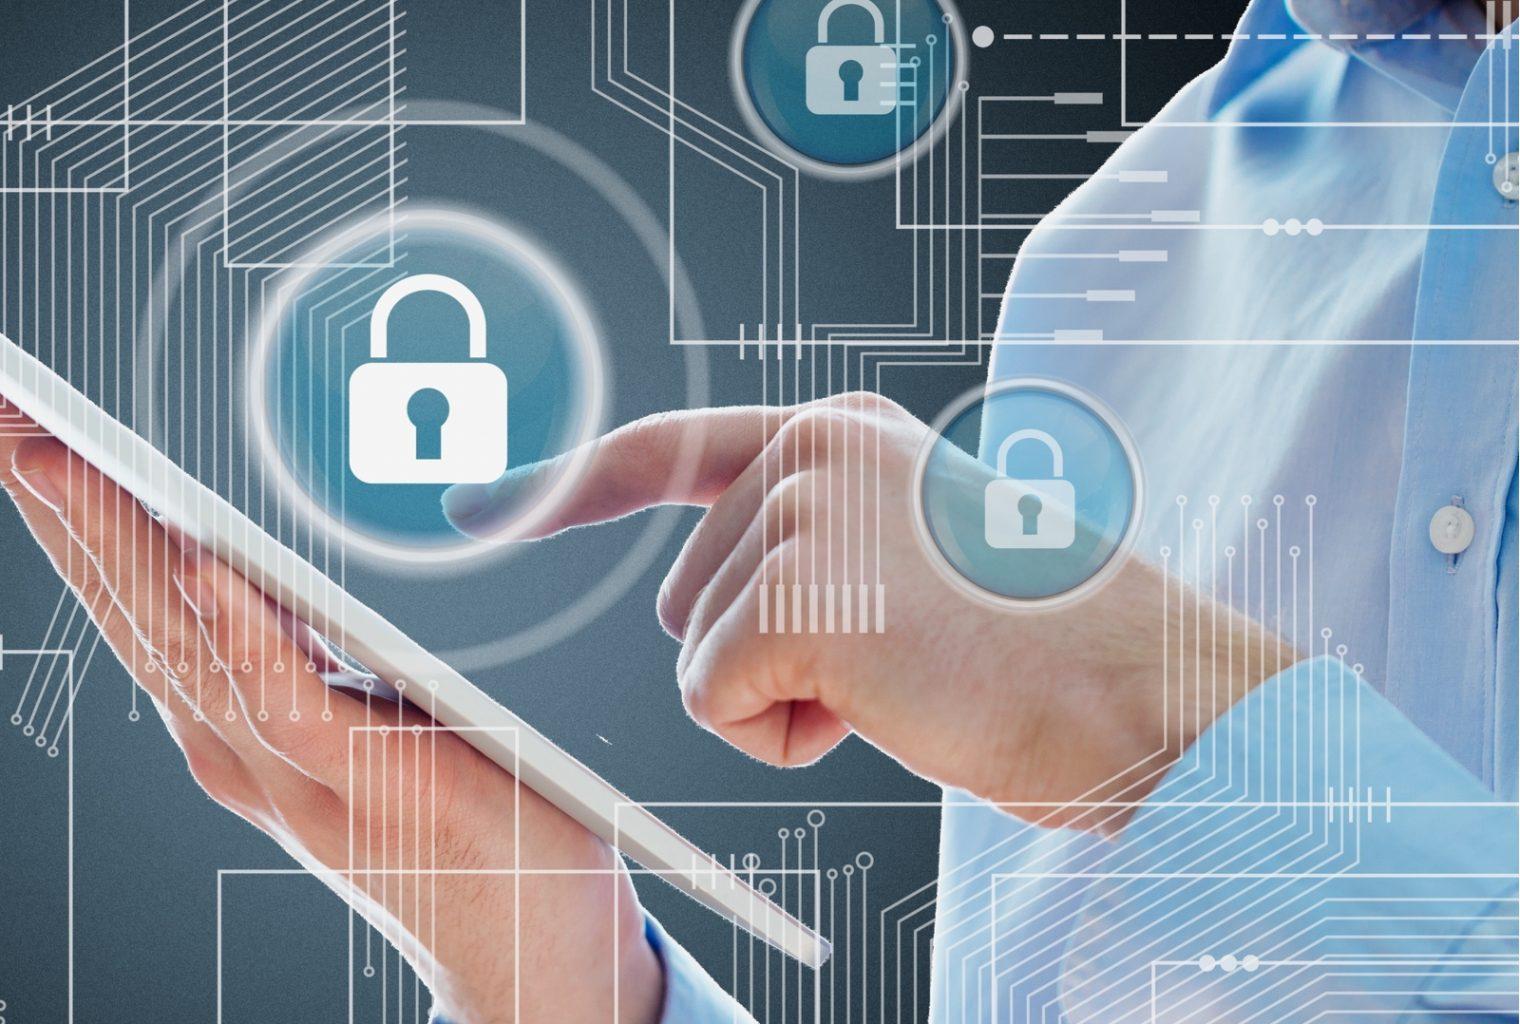 Google Security Expert Warns Against Bitcoin Bragging Online